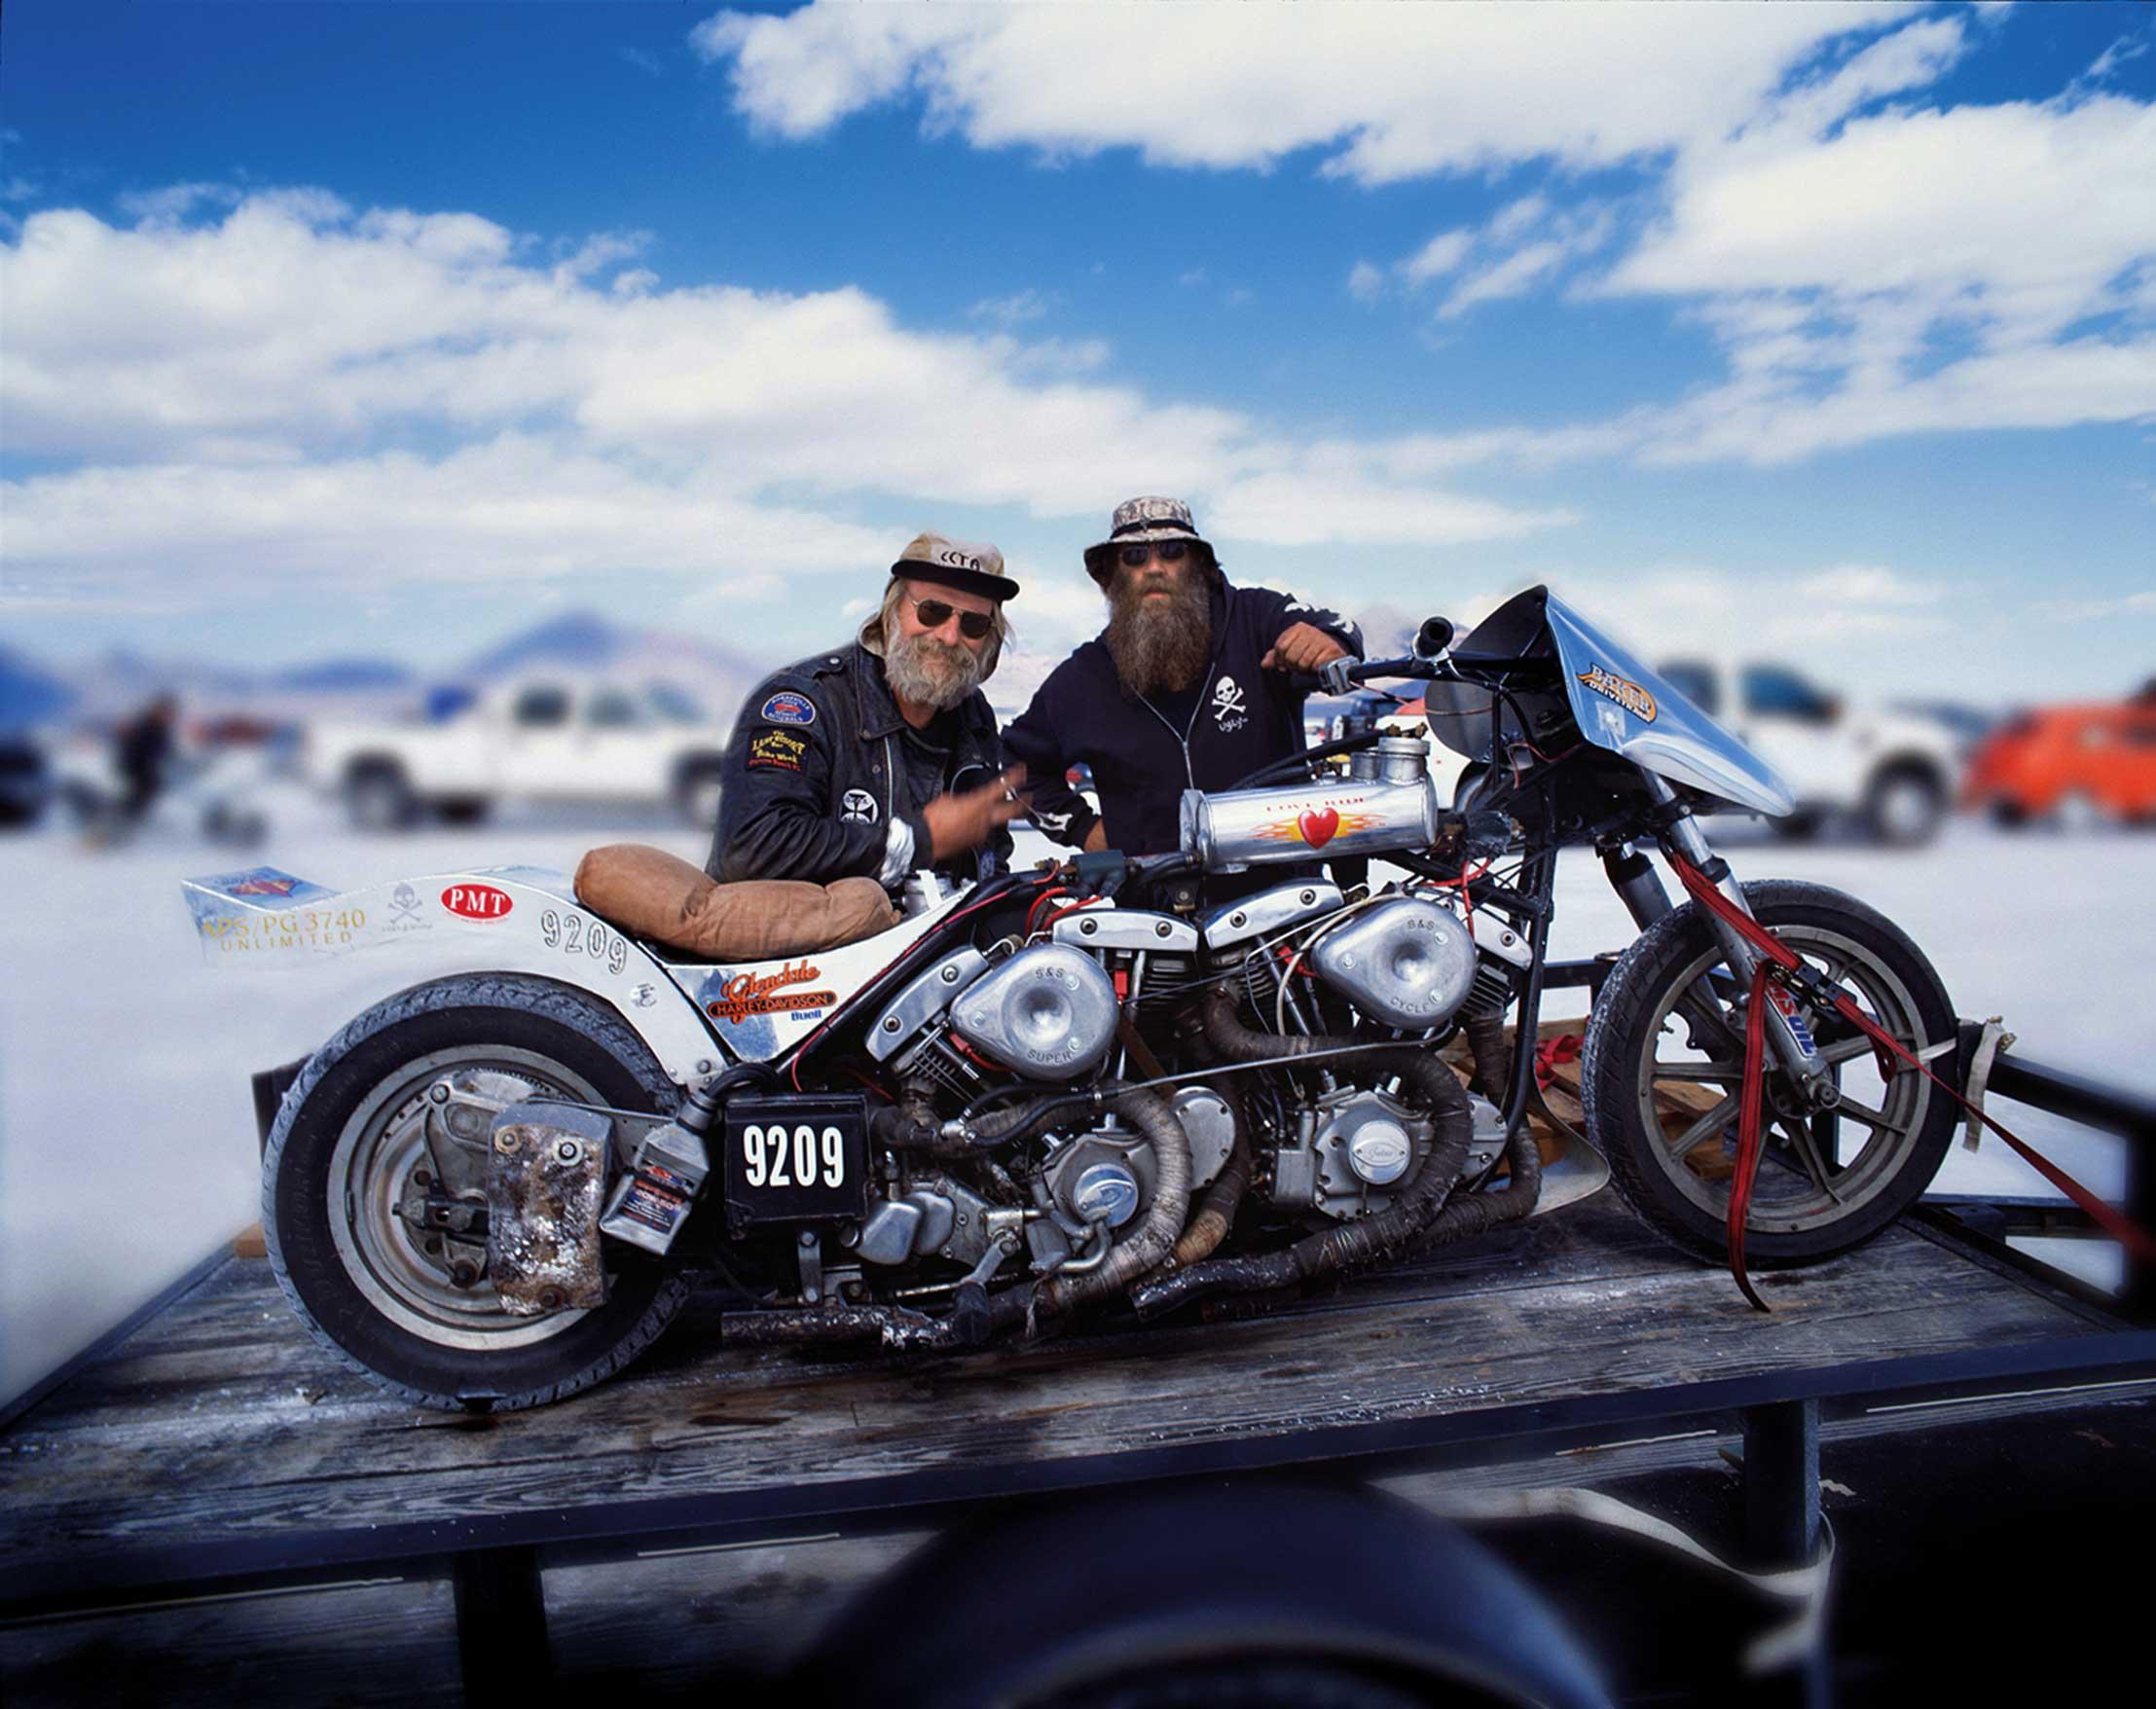 Harley Davidson UTAH Speed Week